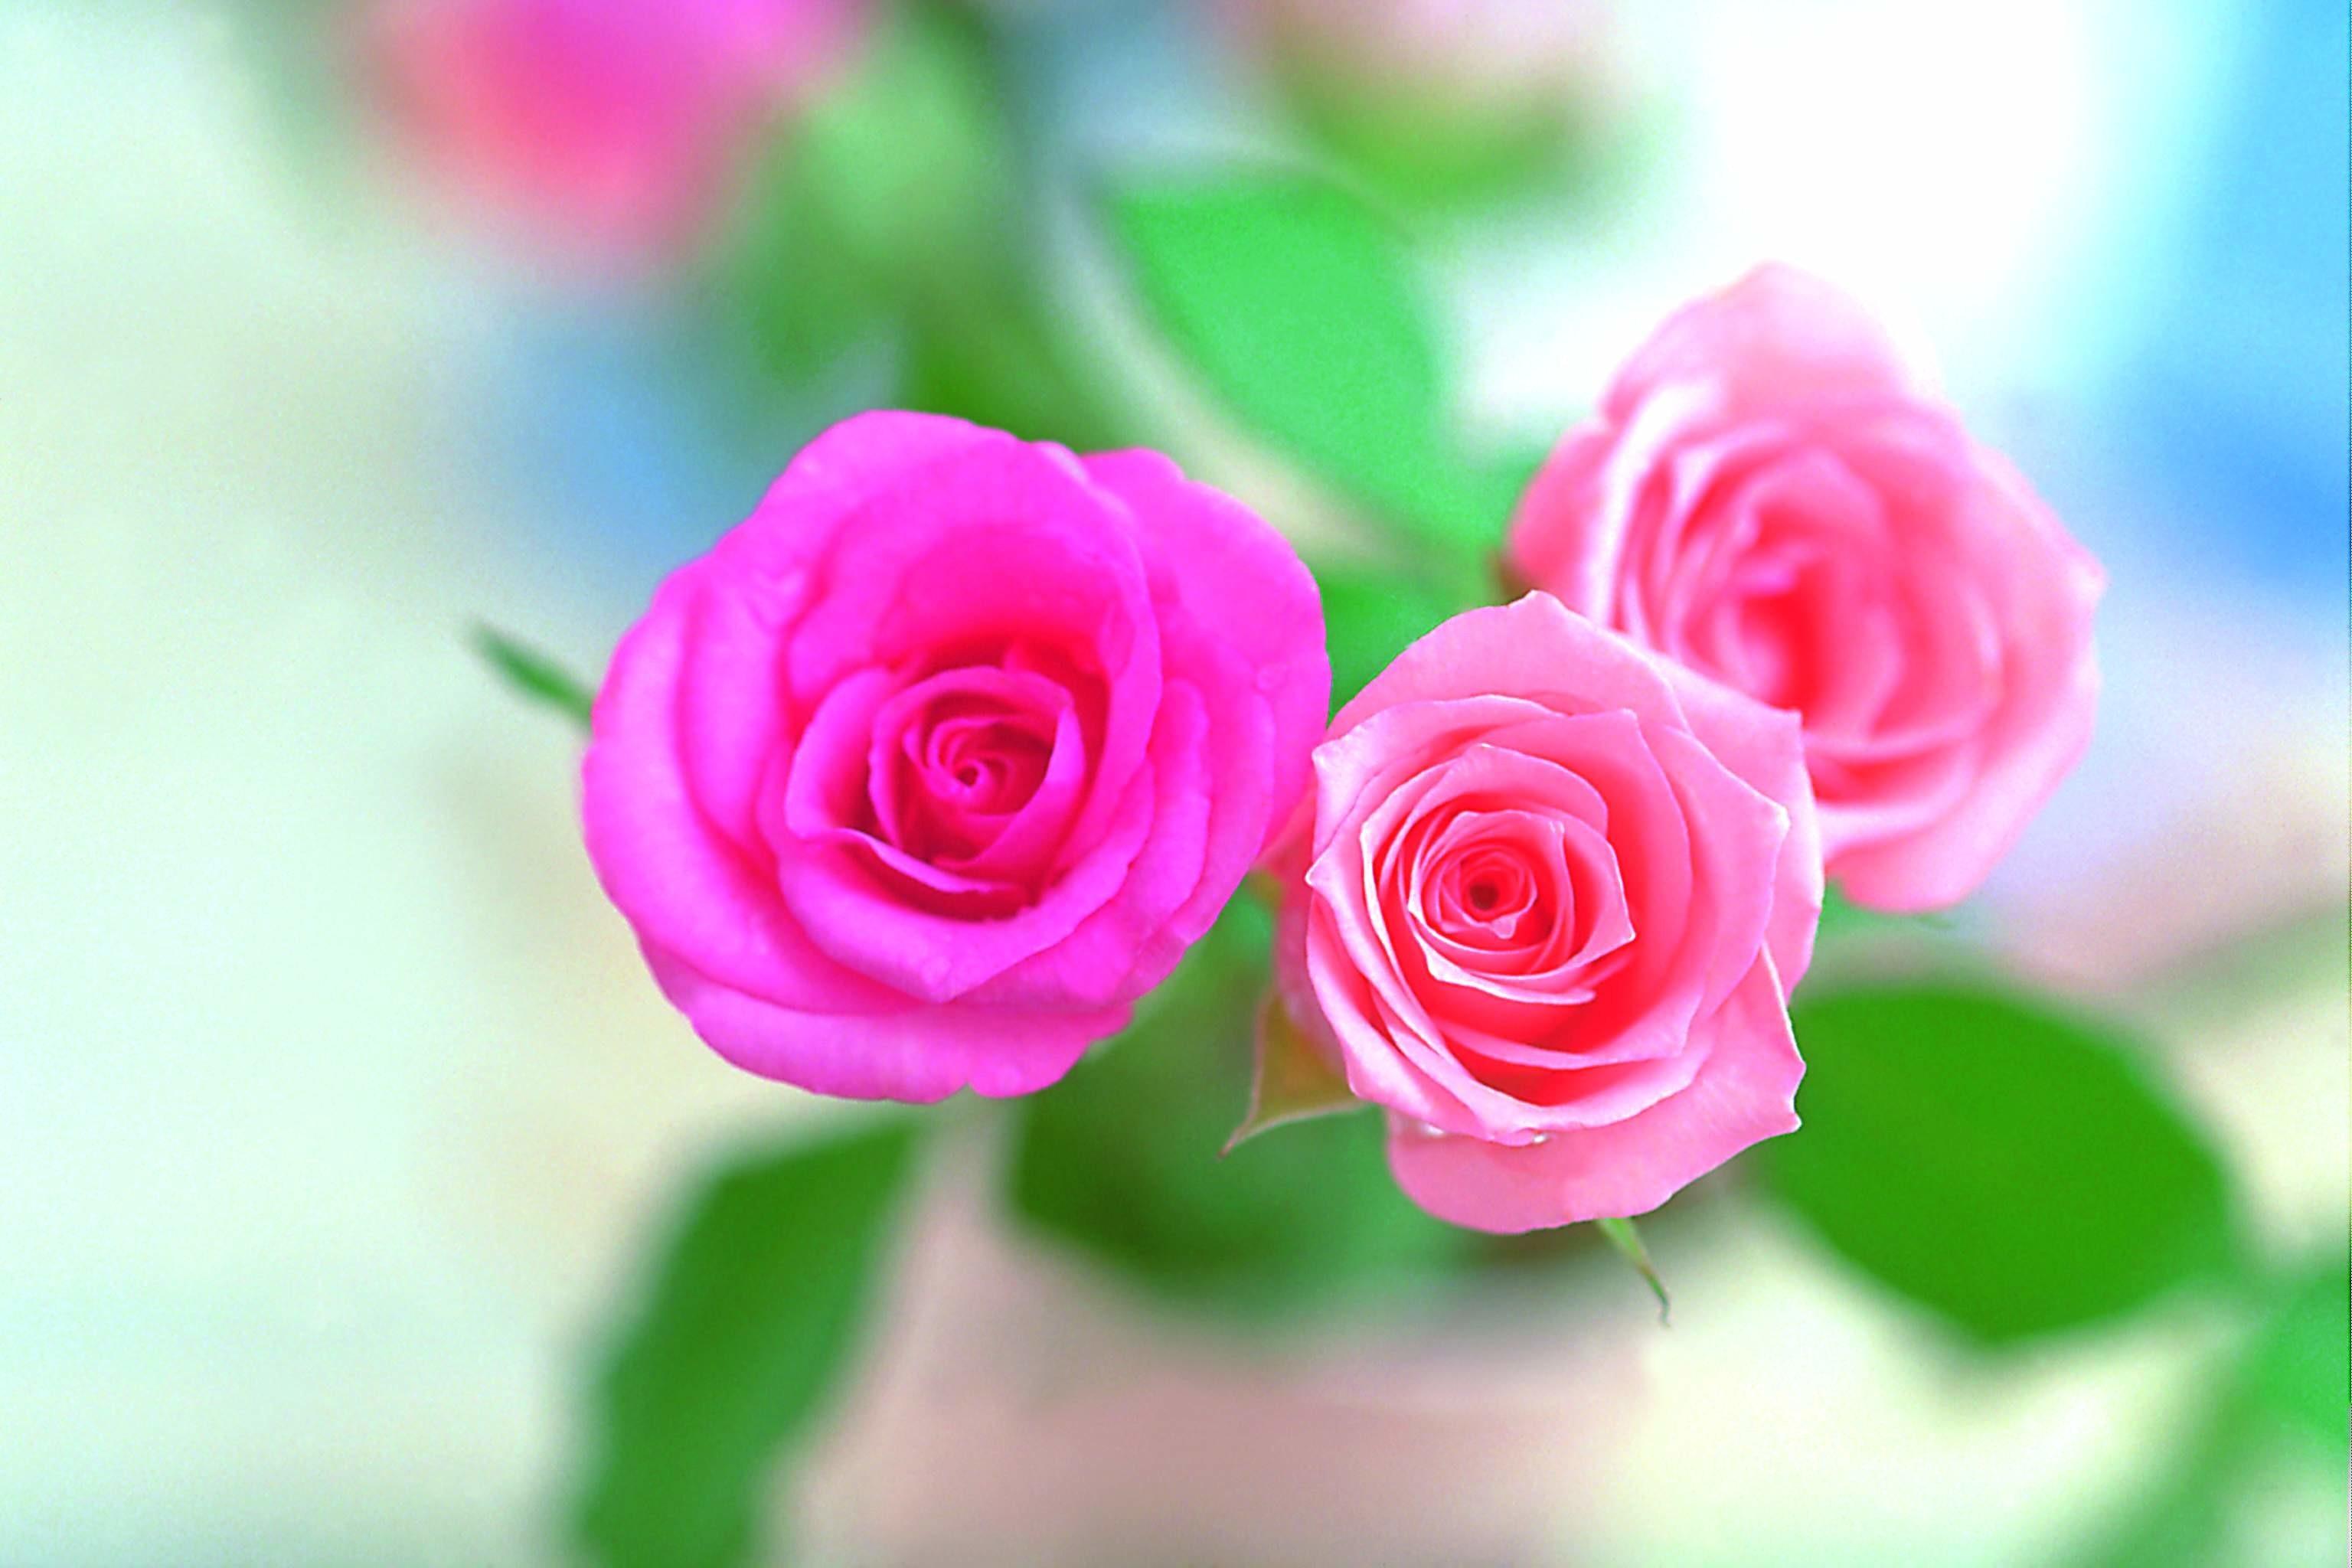 roses wallpaper images